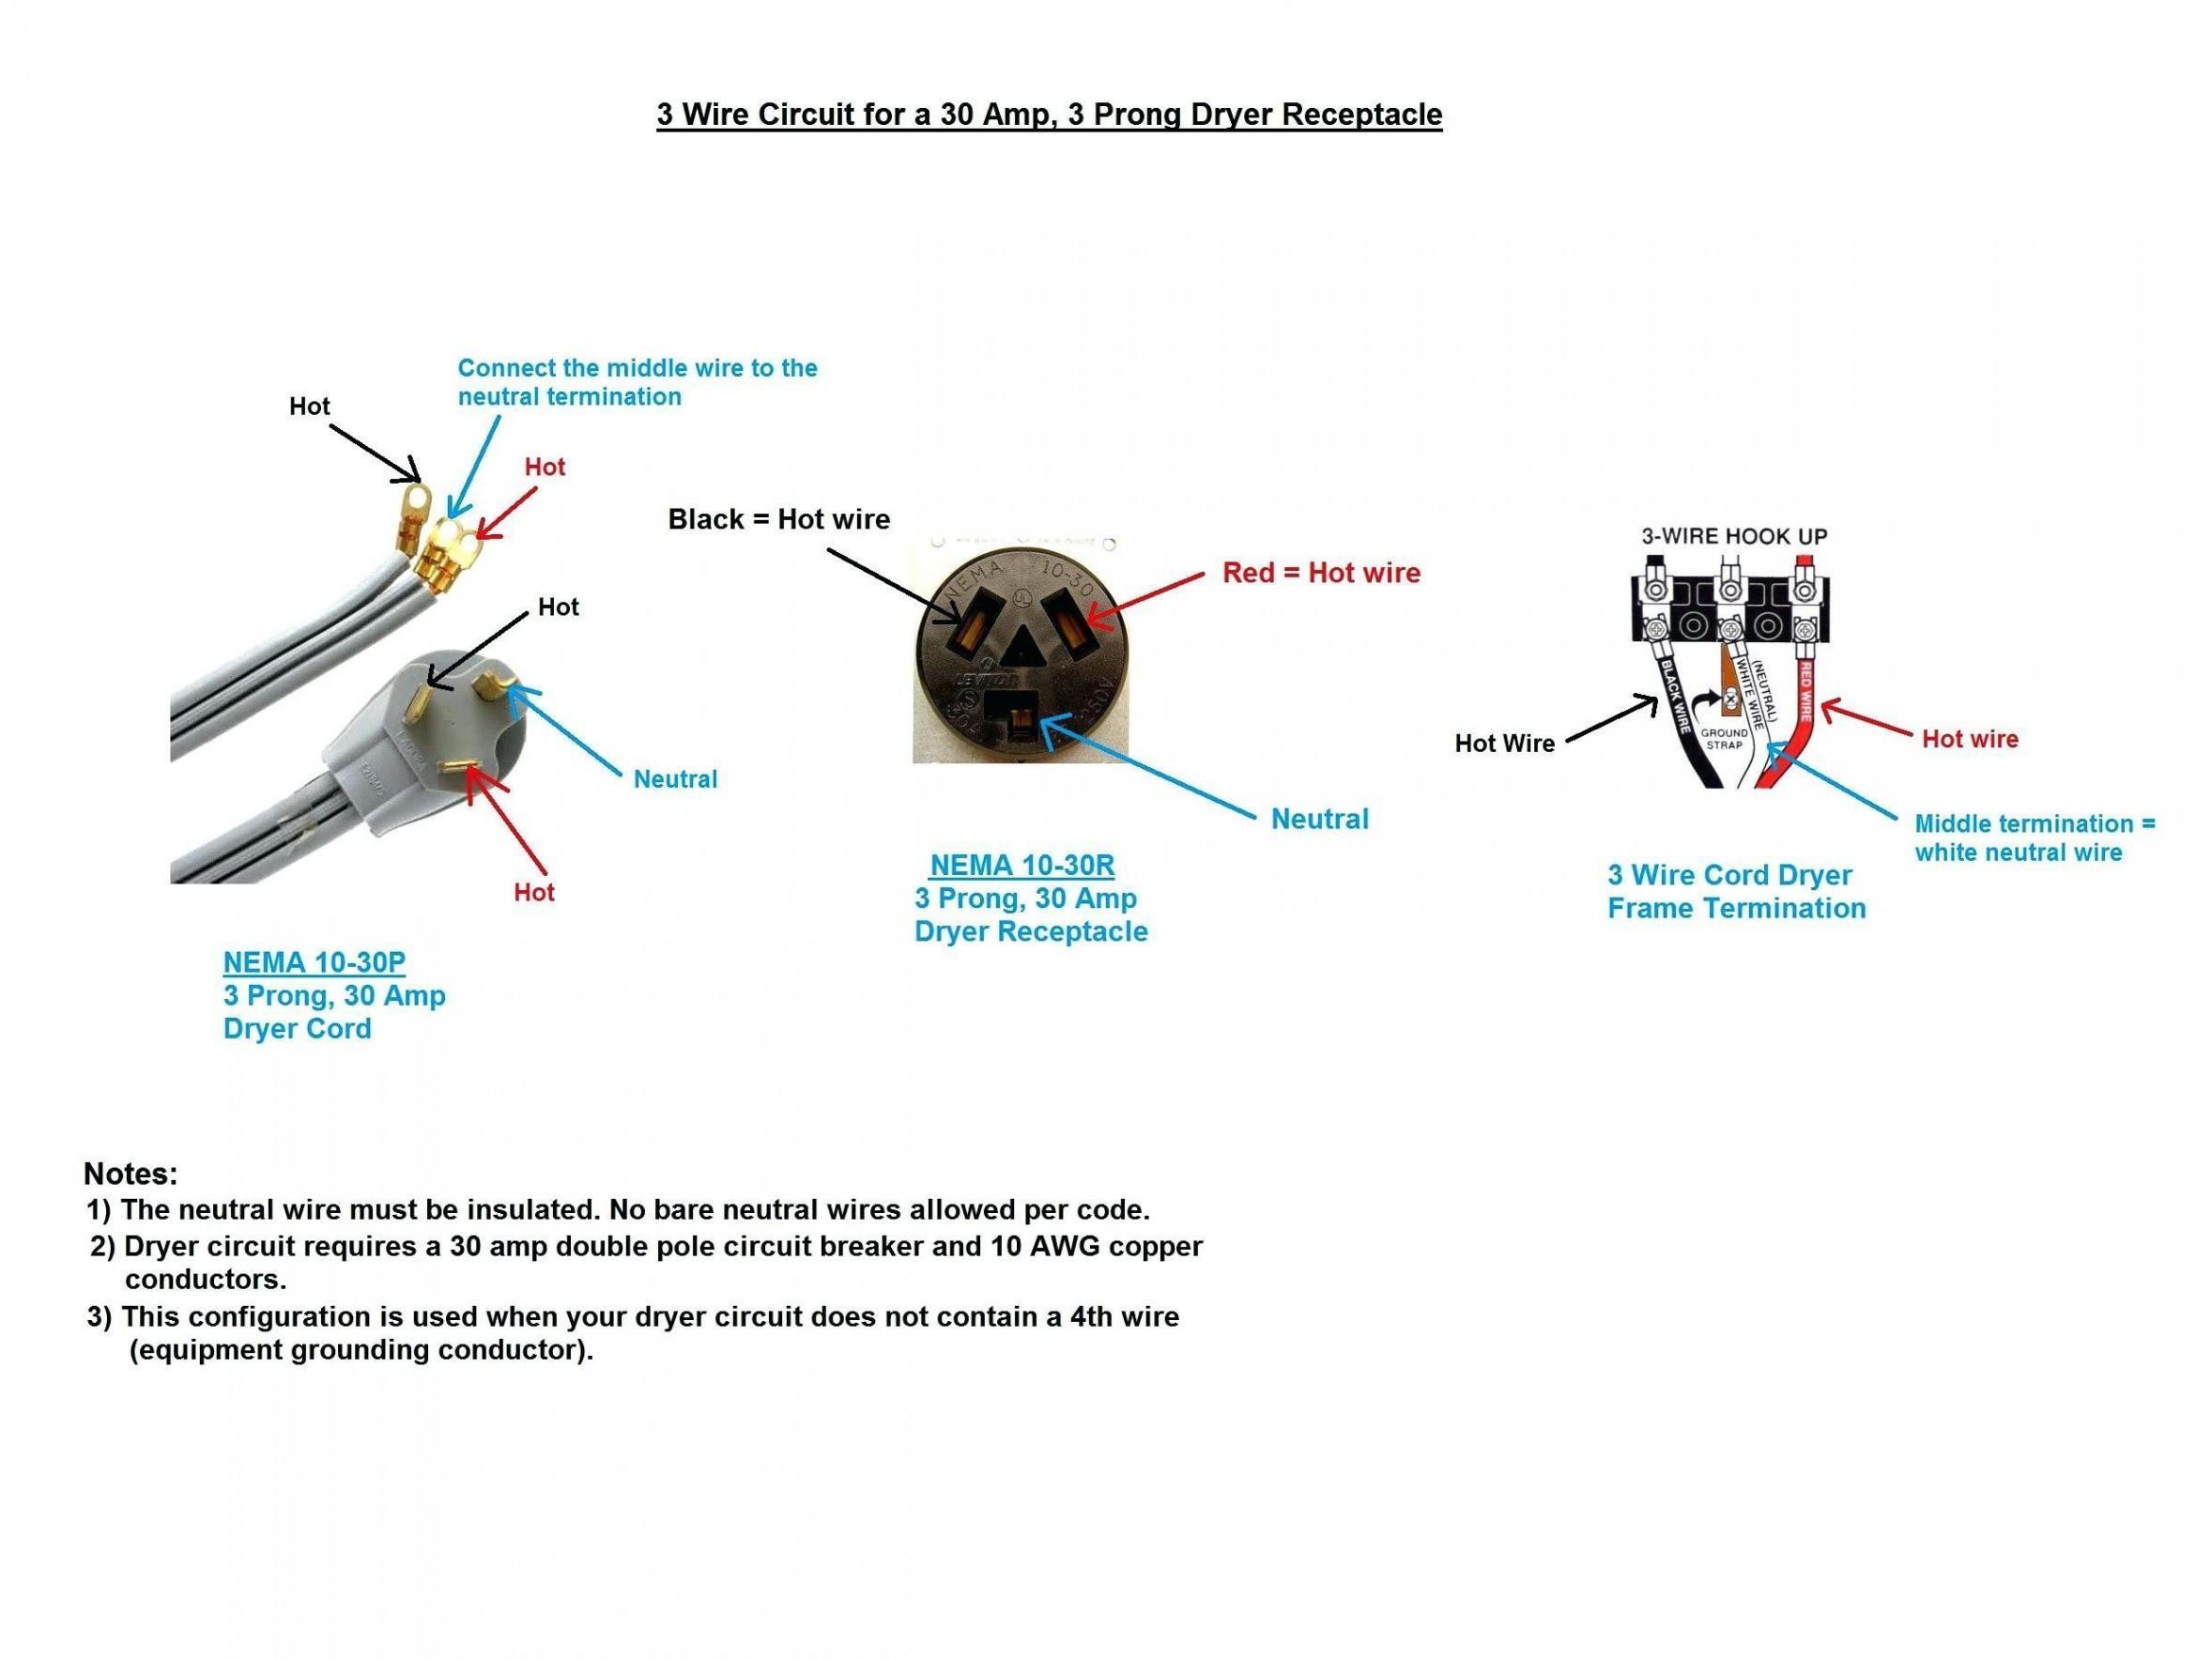 50 Amp Wiring Diagram Book 30 Amp Twist Lock Plug Wiring Diagram – 50 Amp Rv Wiring Diagram